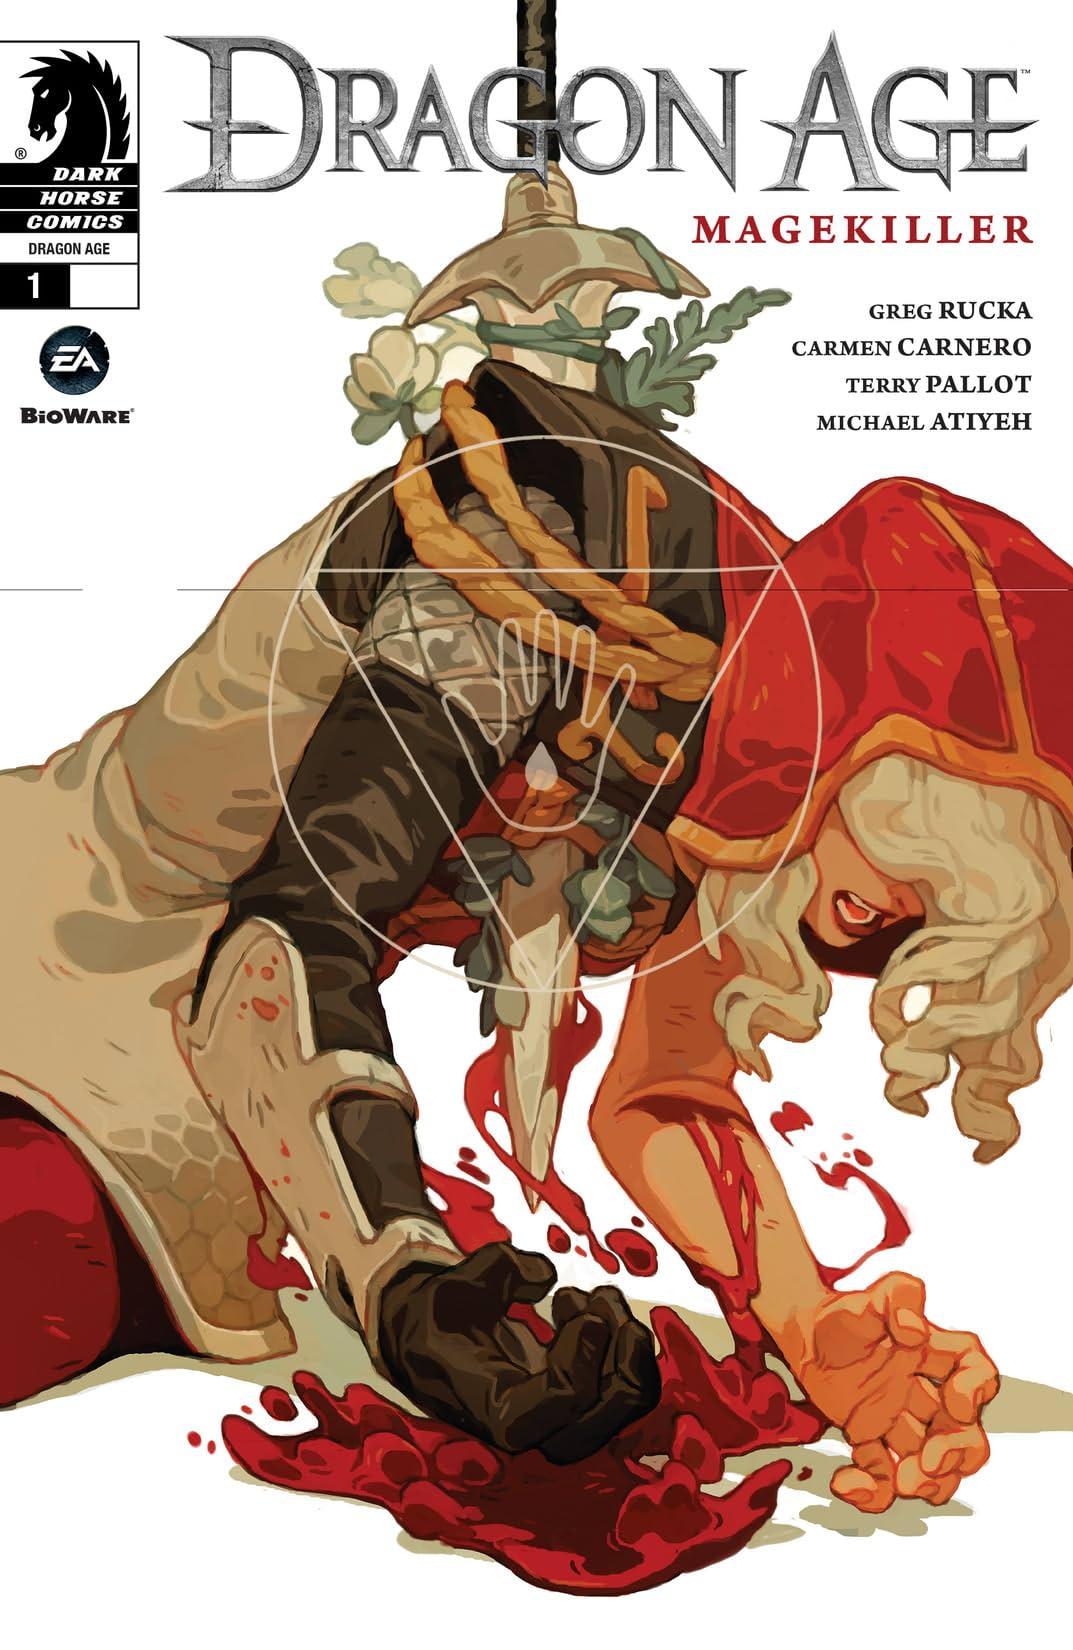 Dragon Age: Magekiller #1